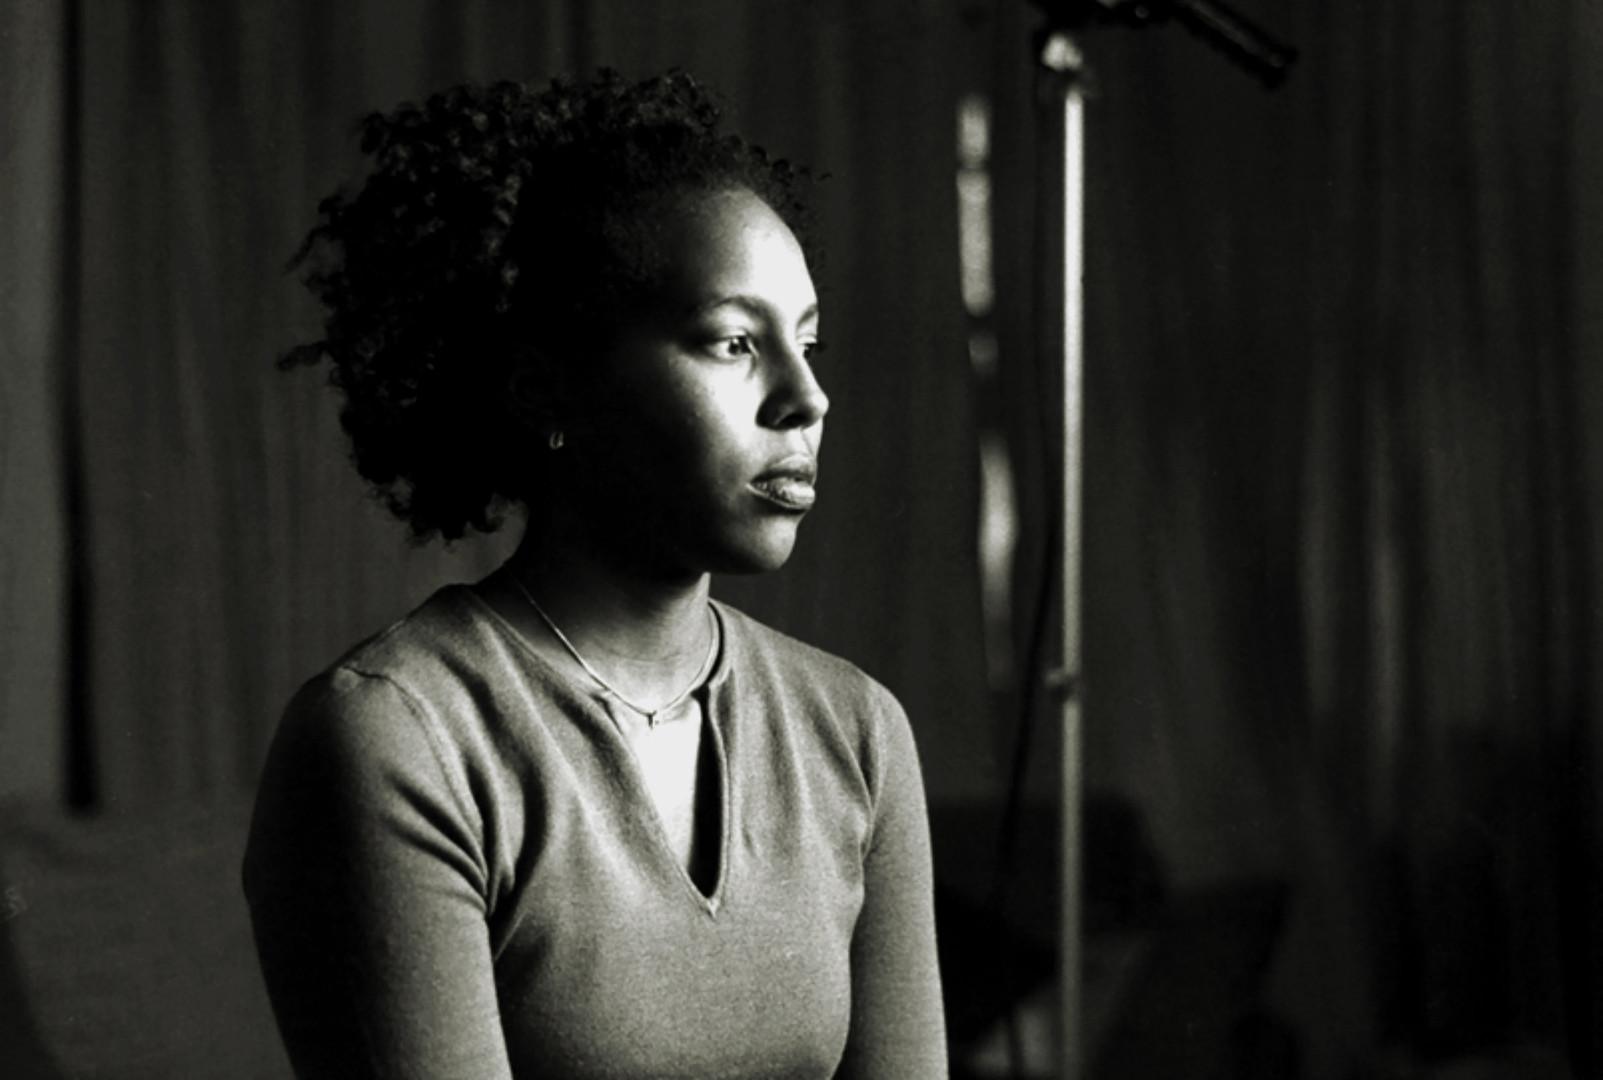 Production still from Aishah Shahidah Simmons' NO! The Rape Documentary